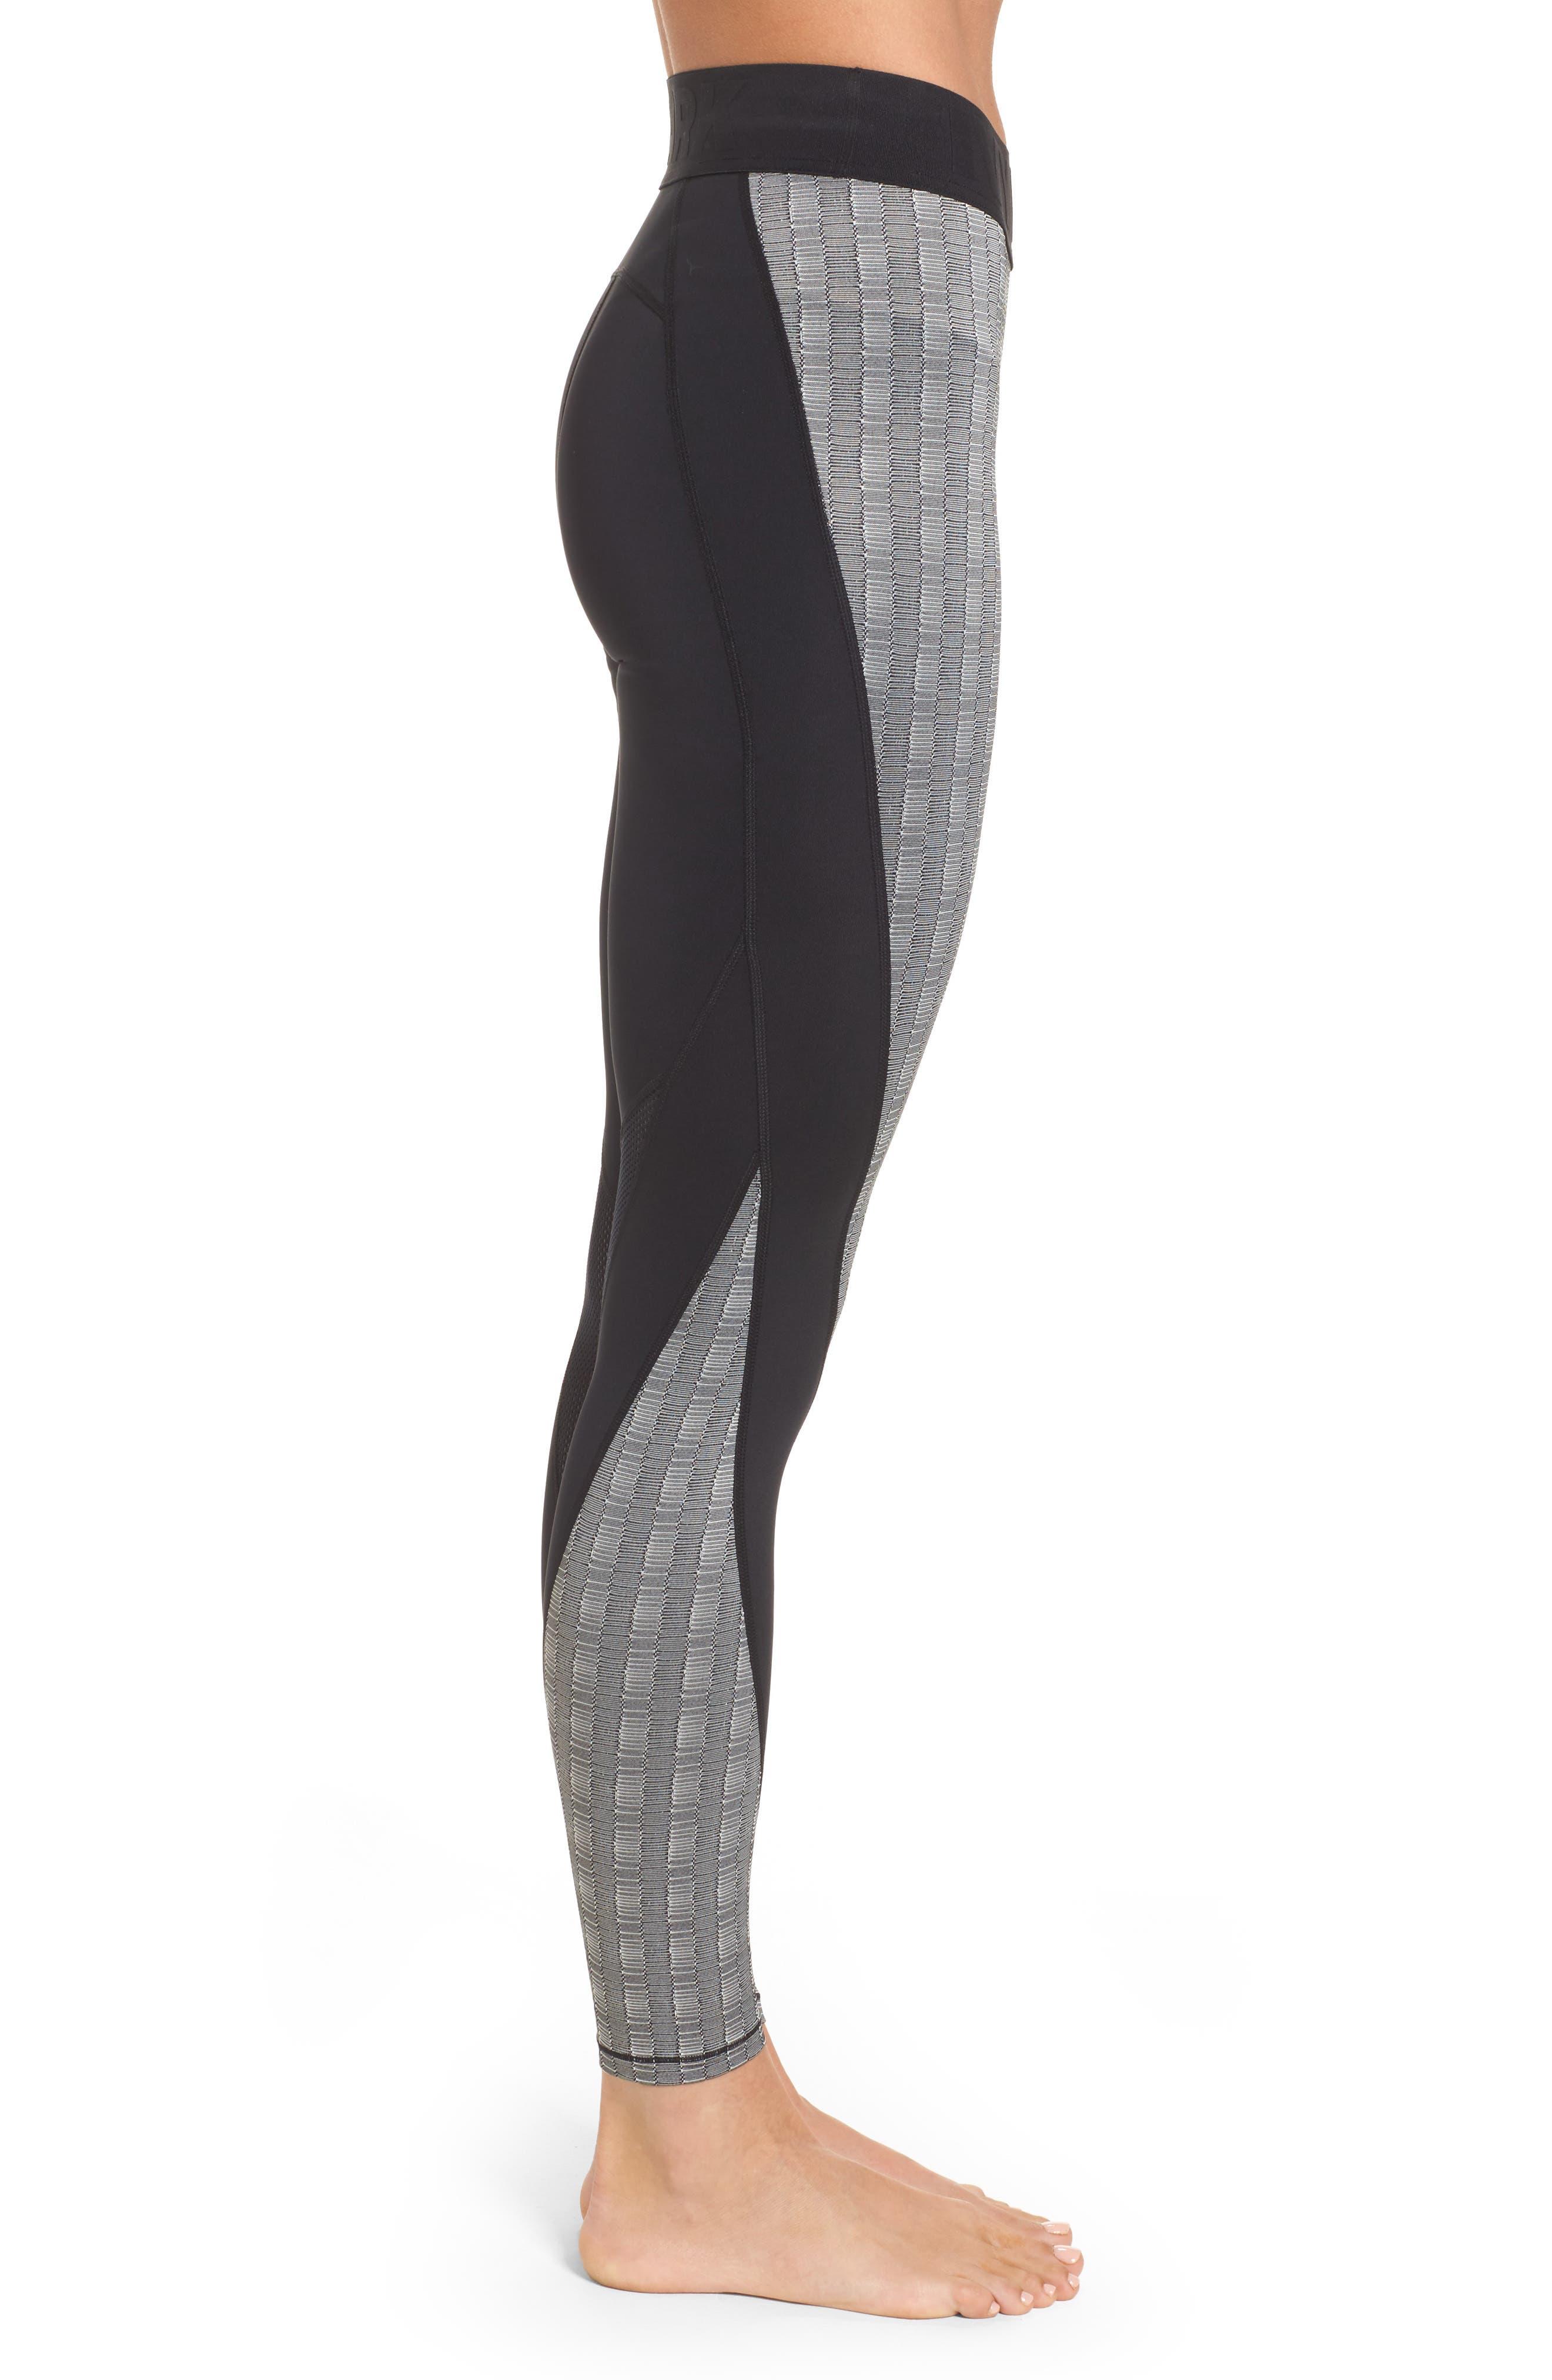 Alternate Image 3  - IVY PARK® Jacquard Block Ankle Leggings